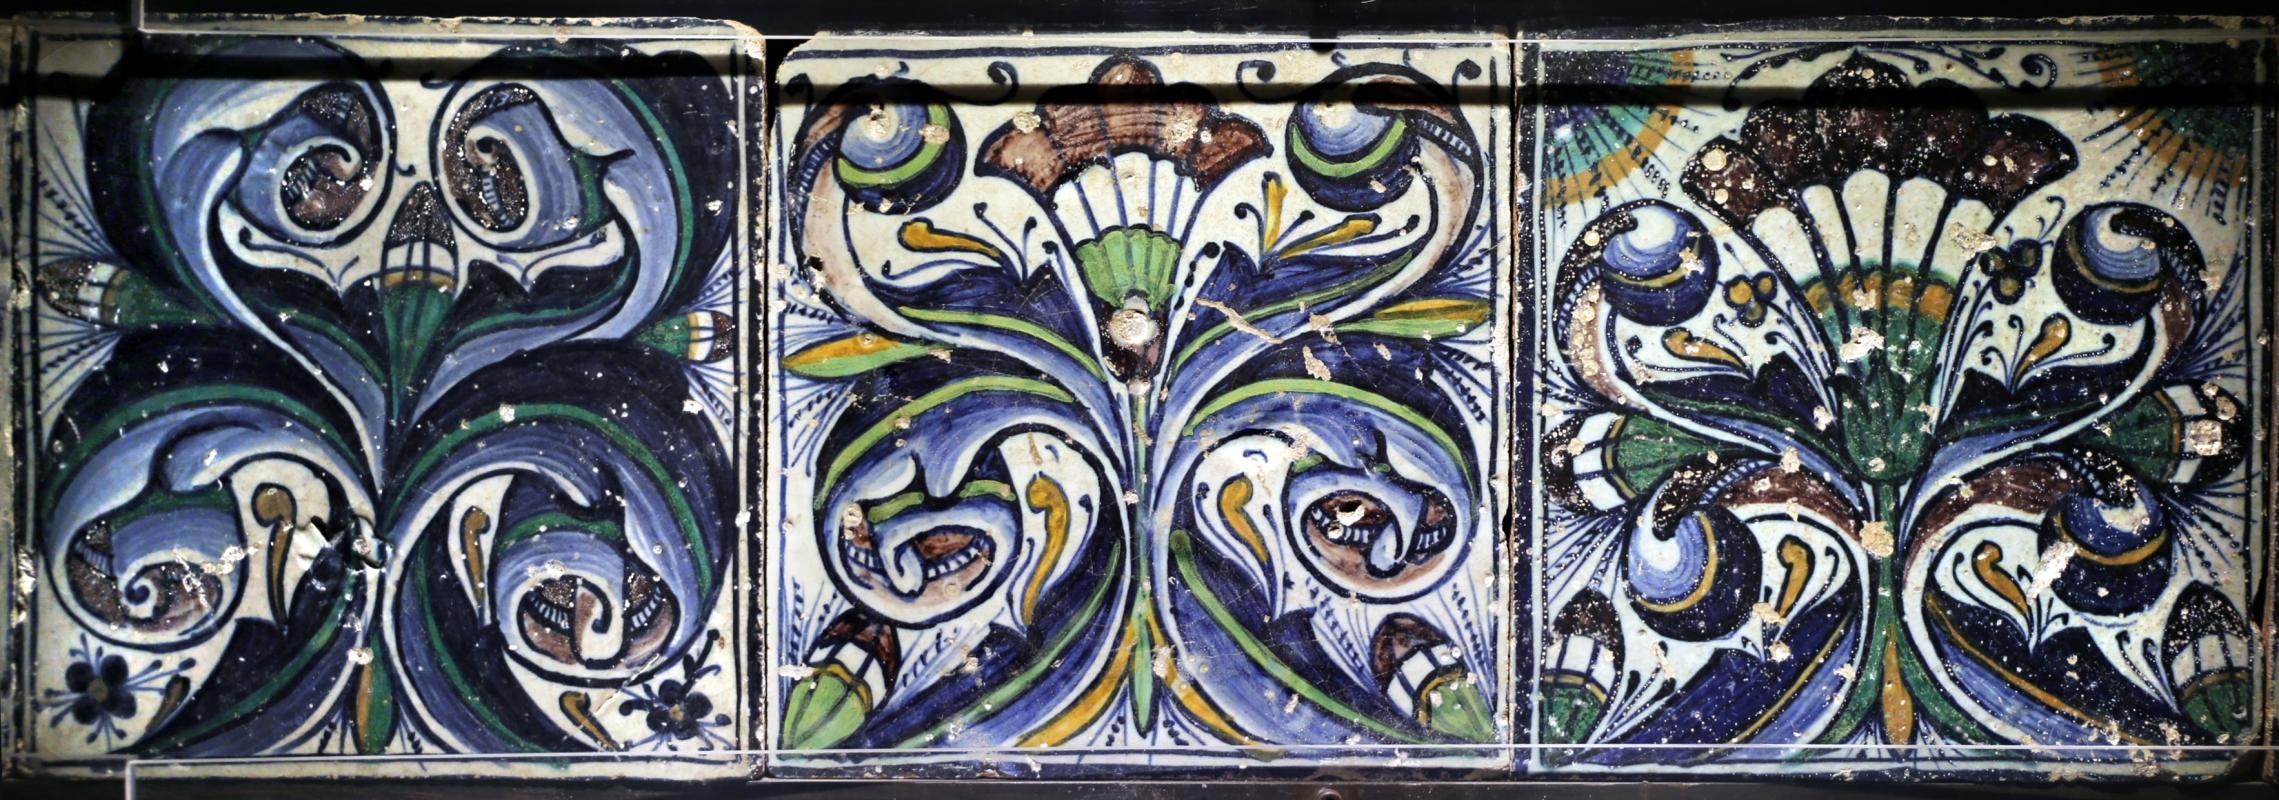 Bottega pesarese, pavimento maiolicato dal monastero di san paolo a parma, 1470-82 ca., volute vegetali - Sailko - Parma (PR)